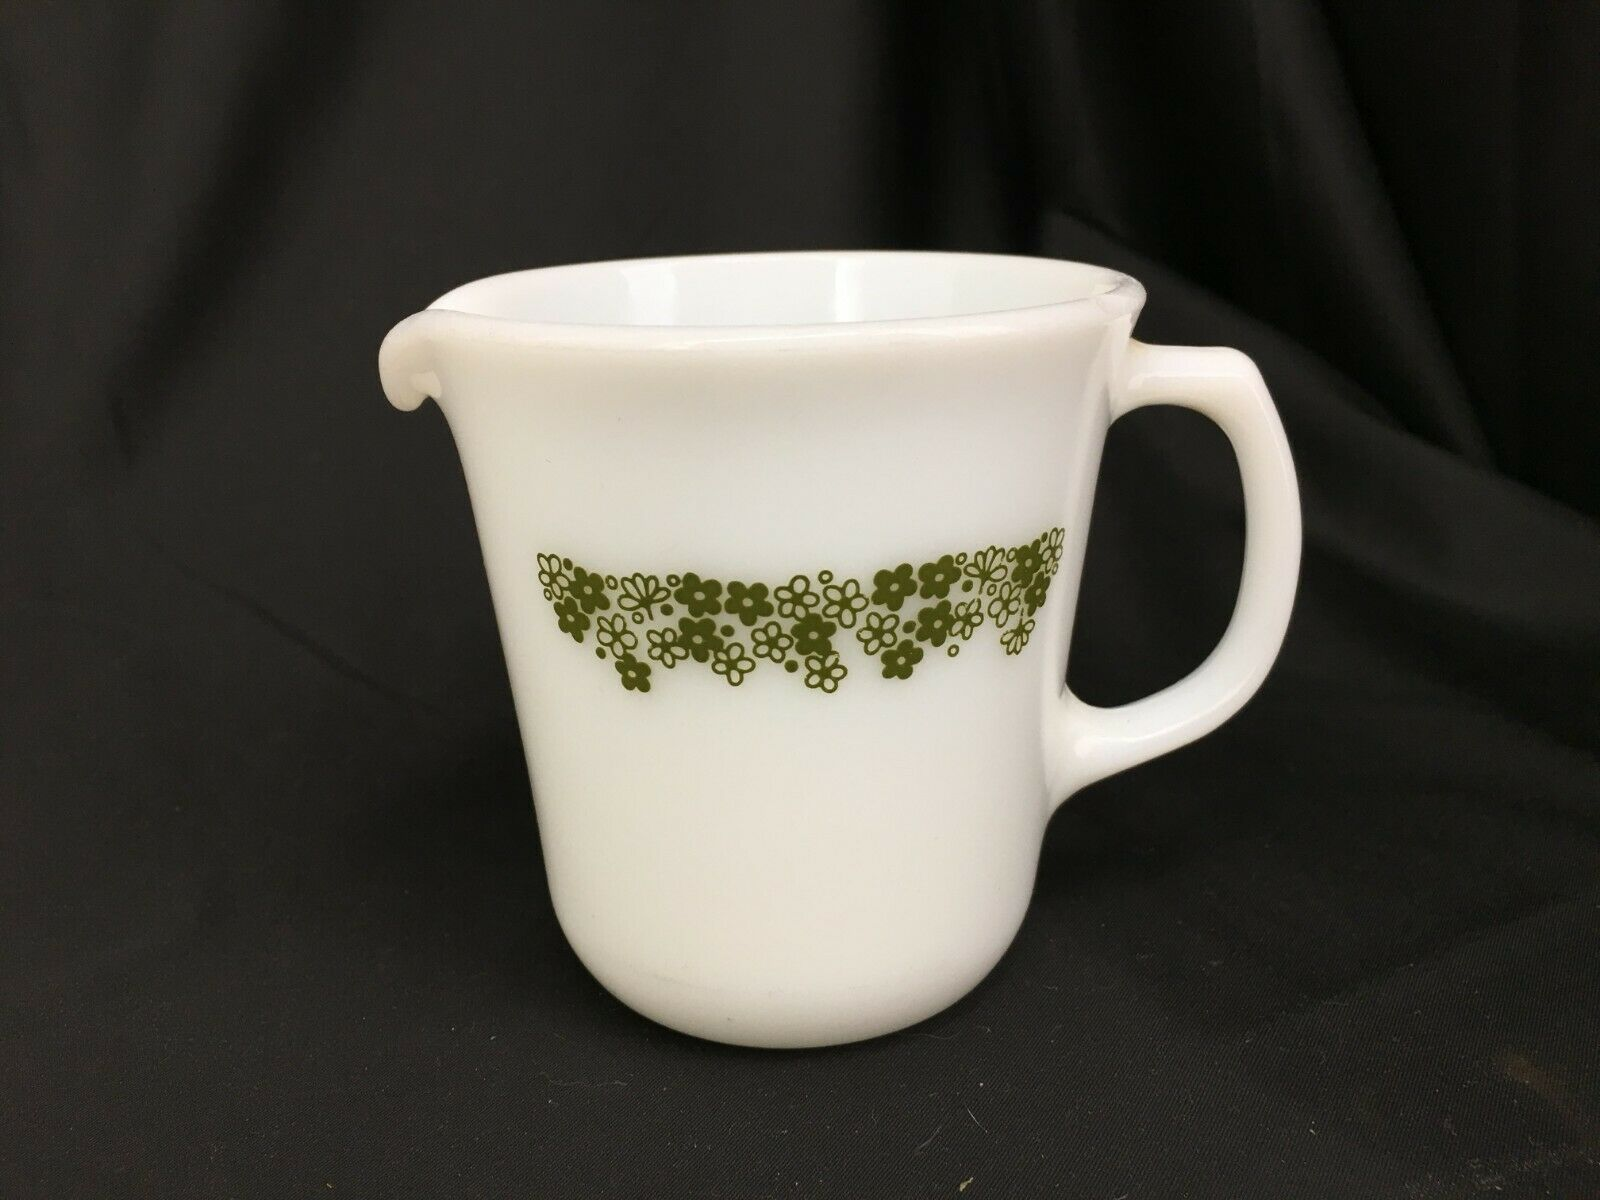 Vintage Pyrex Creamer Cup Crazy Daisy - $14.99